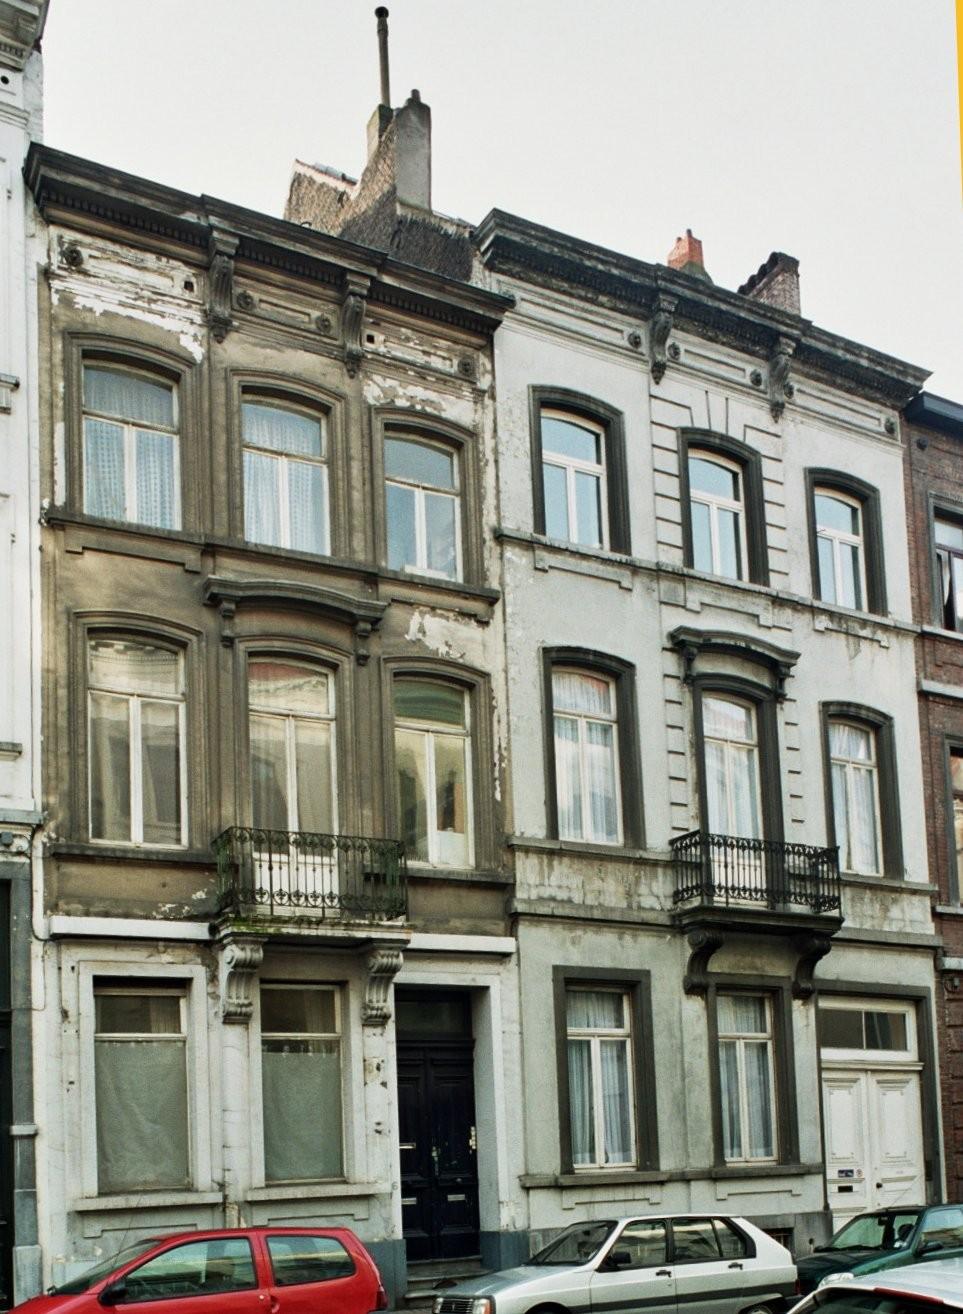 Rue Berckmans 6, 8., 2004